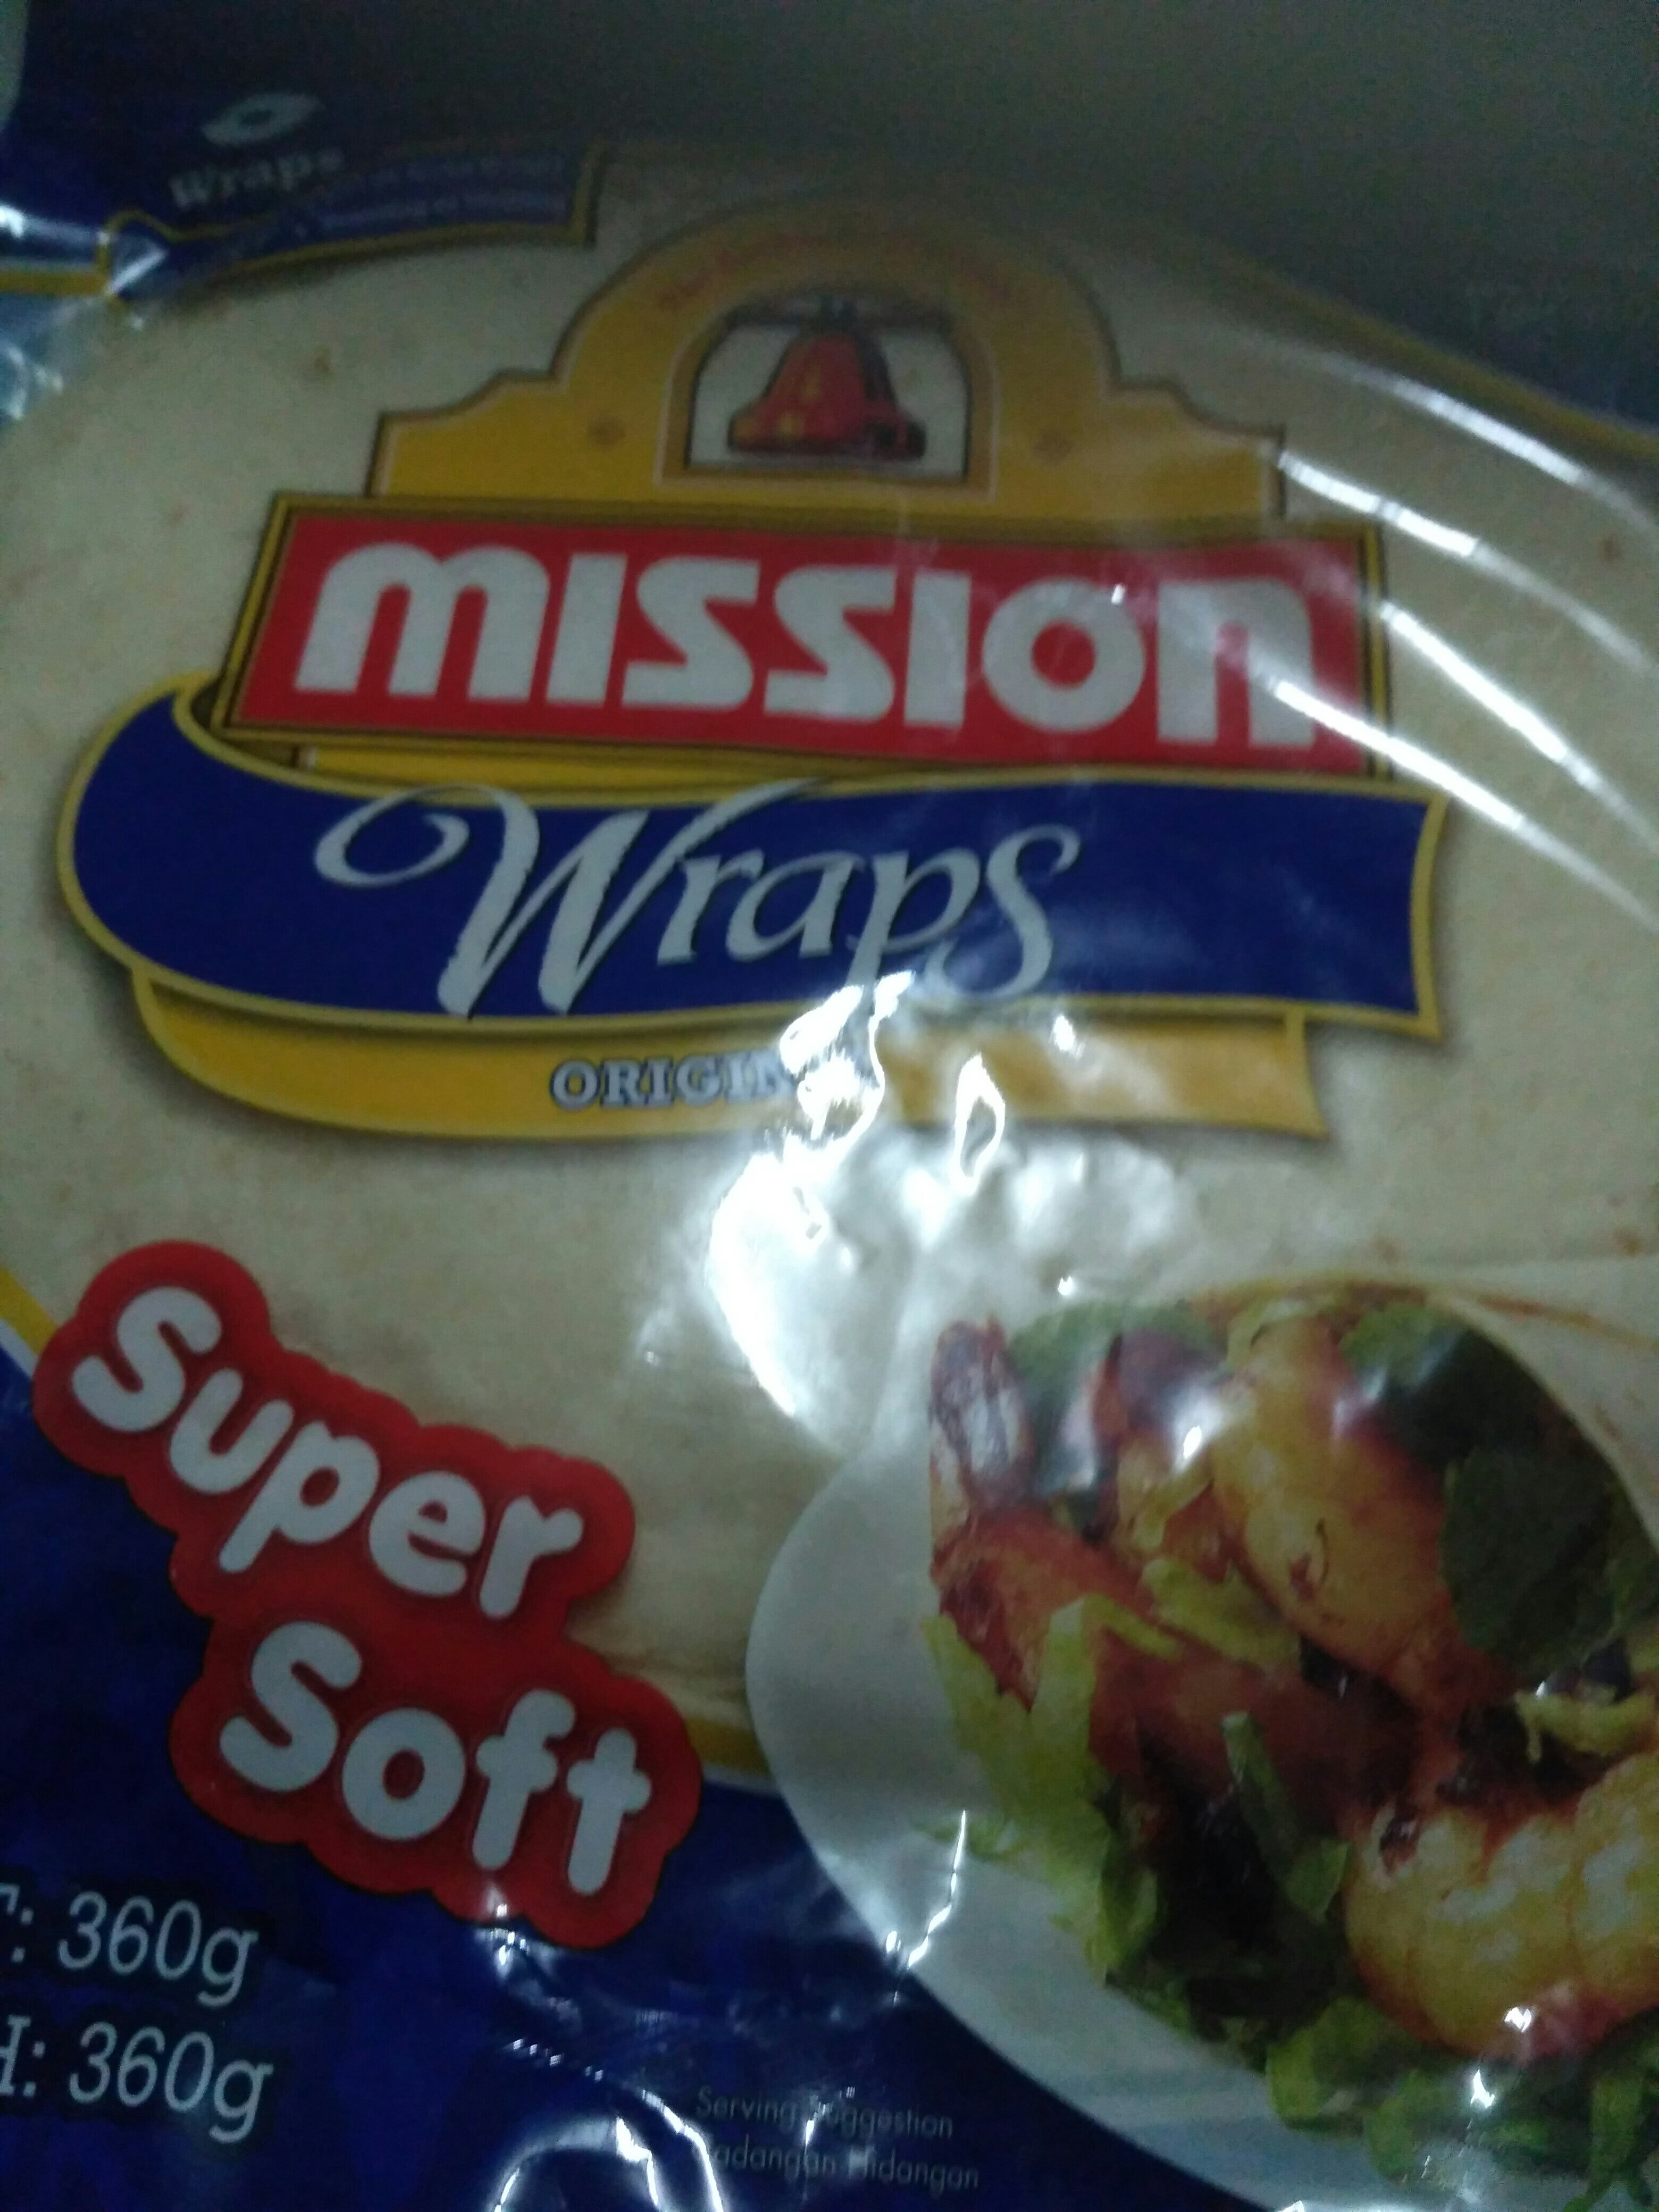 Tortillas Wrap Original 8 Per Pack - Produit - fr